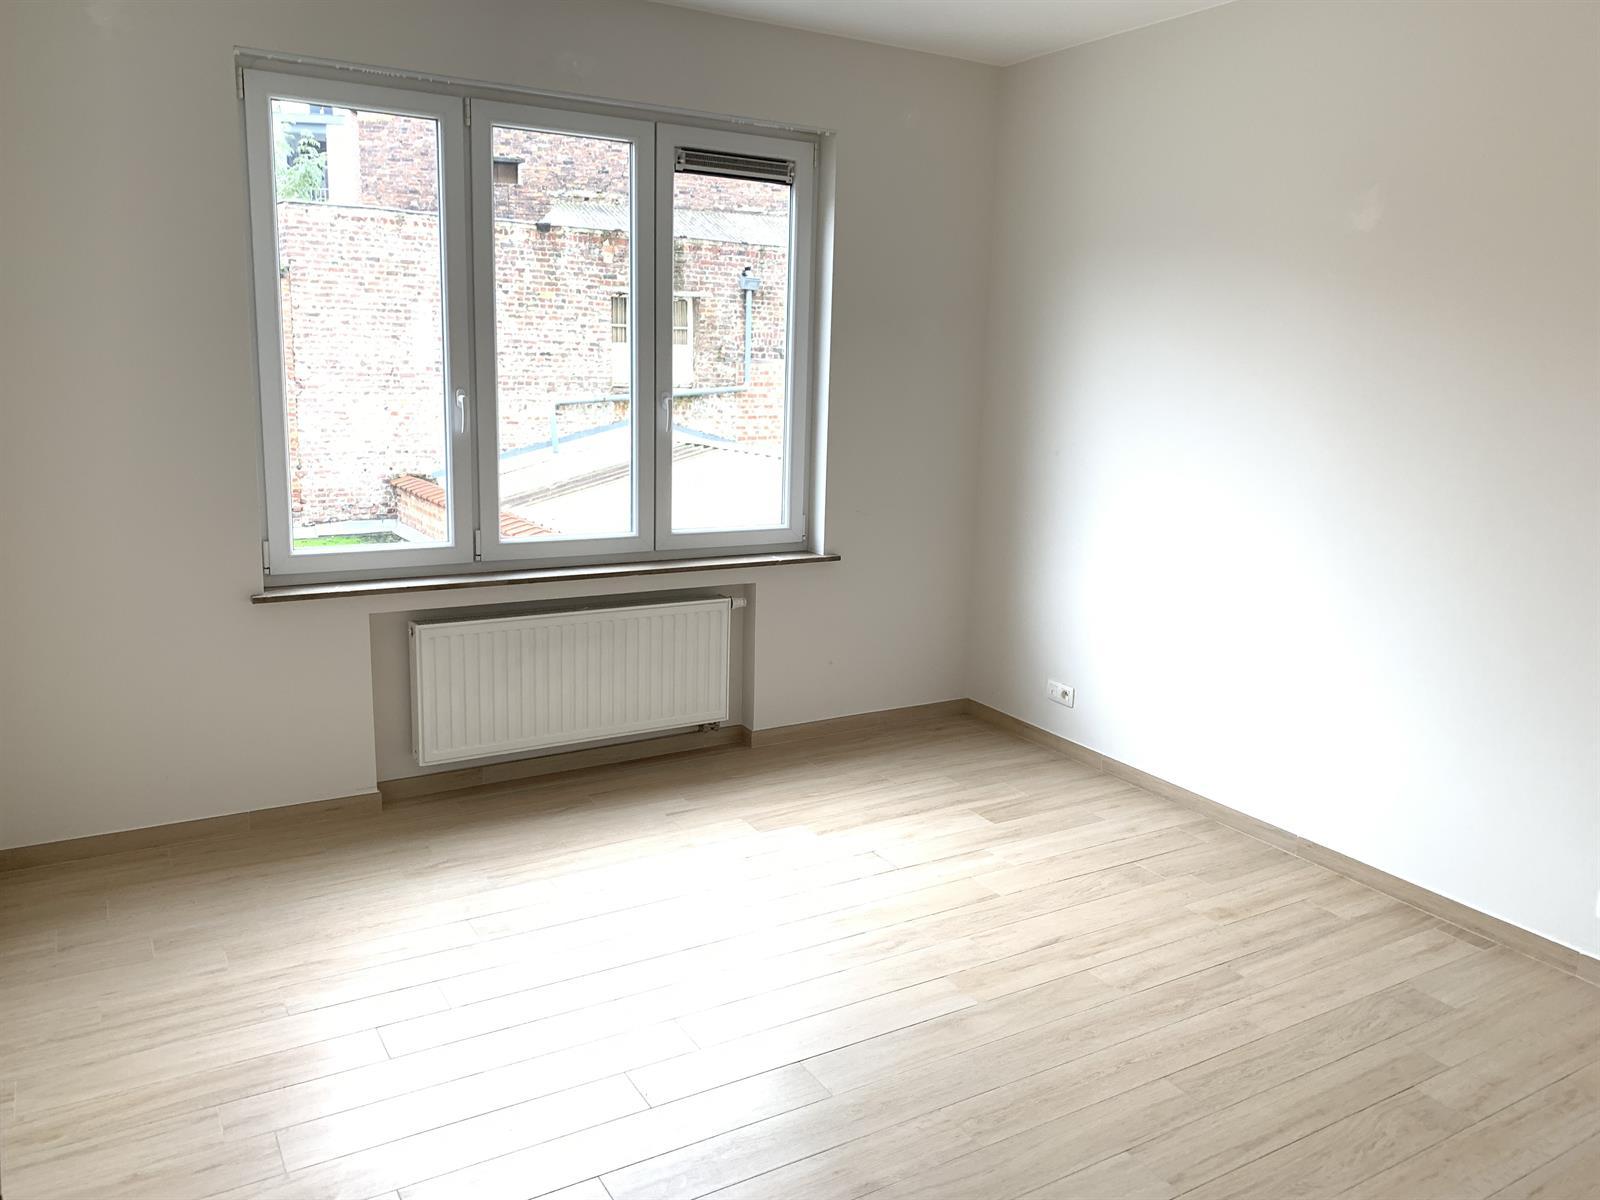 Appartement - Molenbeek-Saint-Jean - #4199507-6